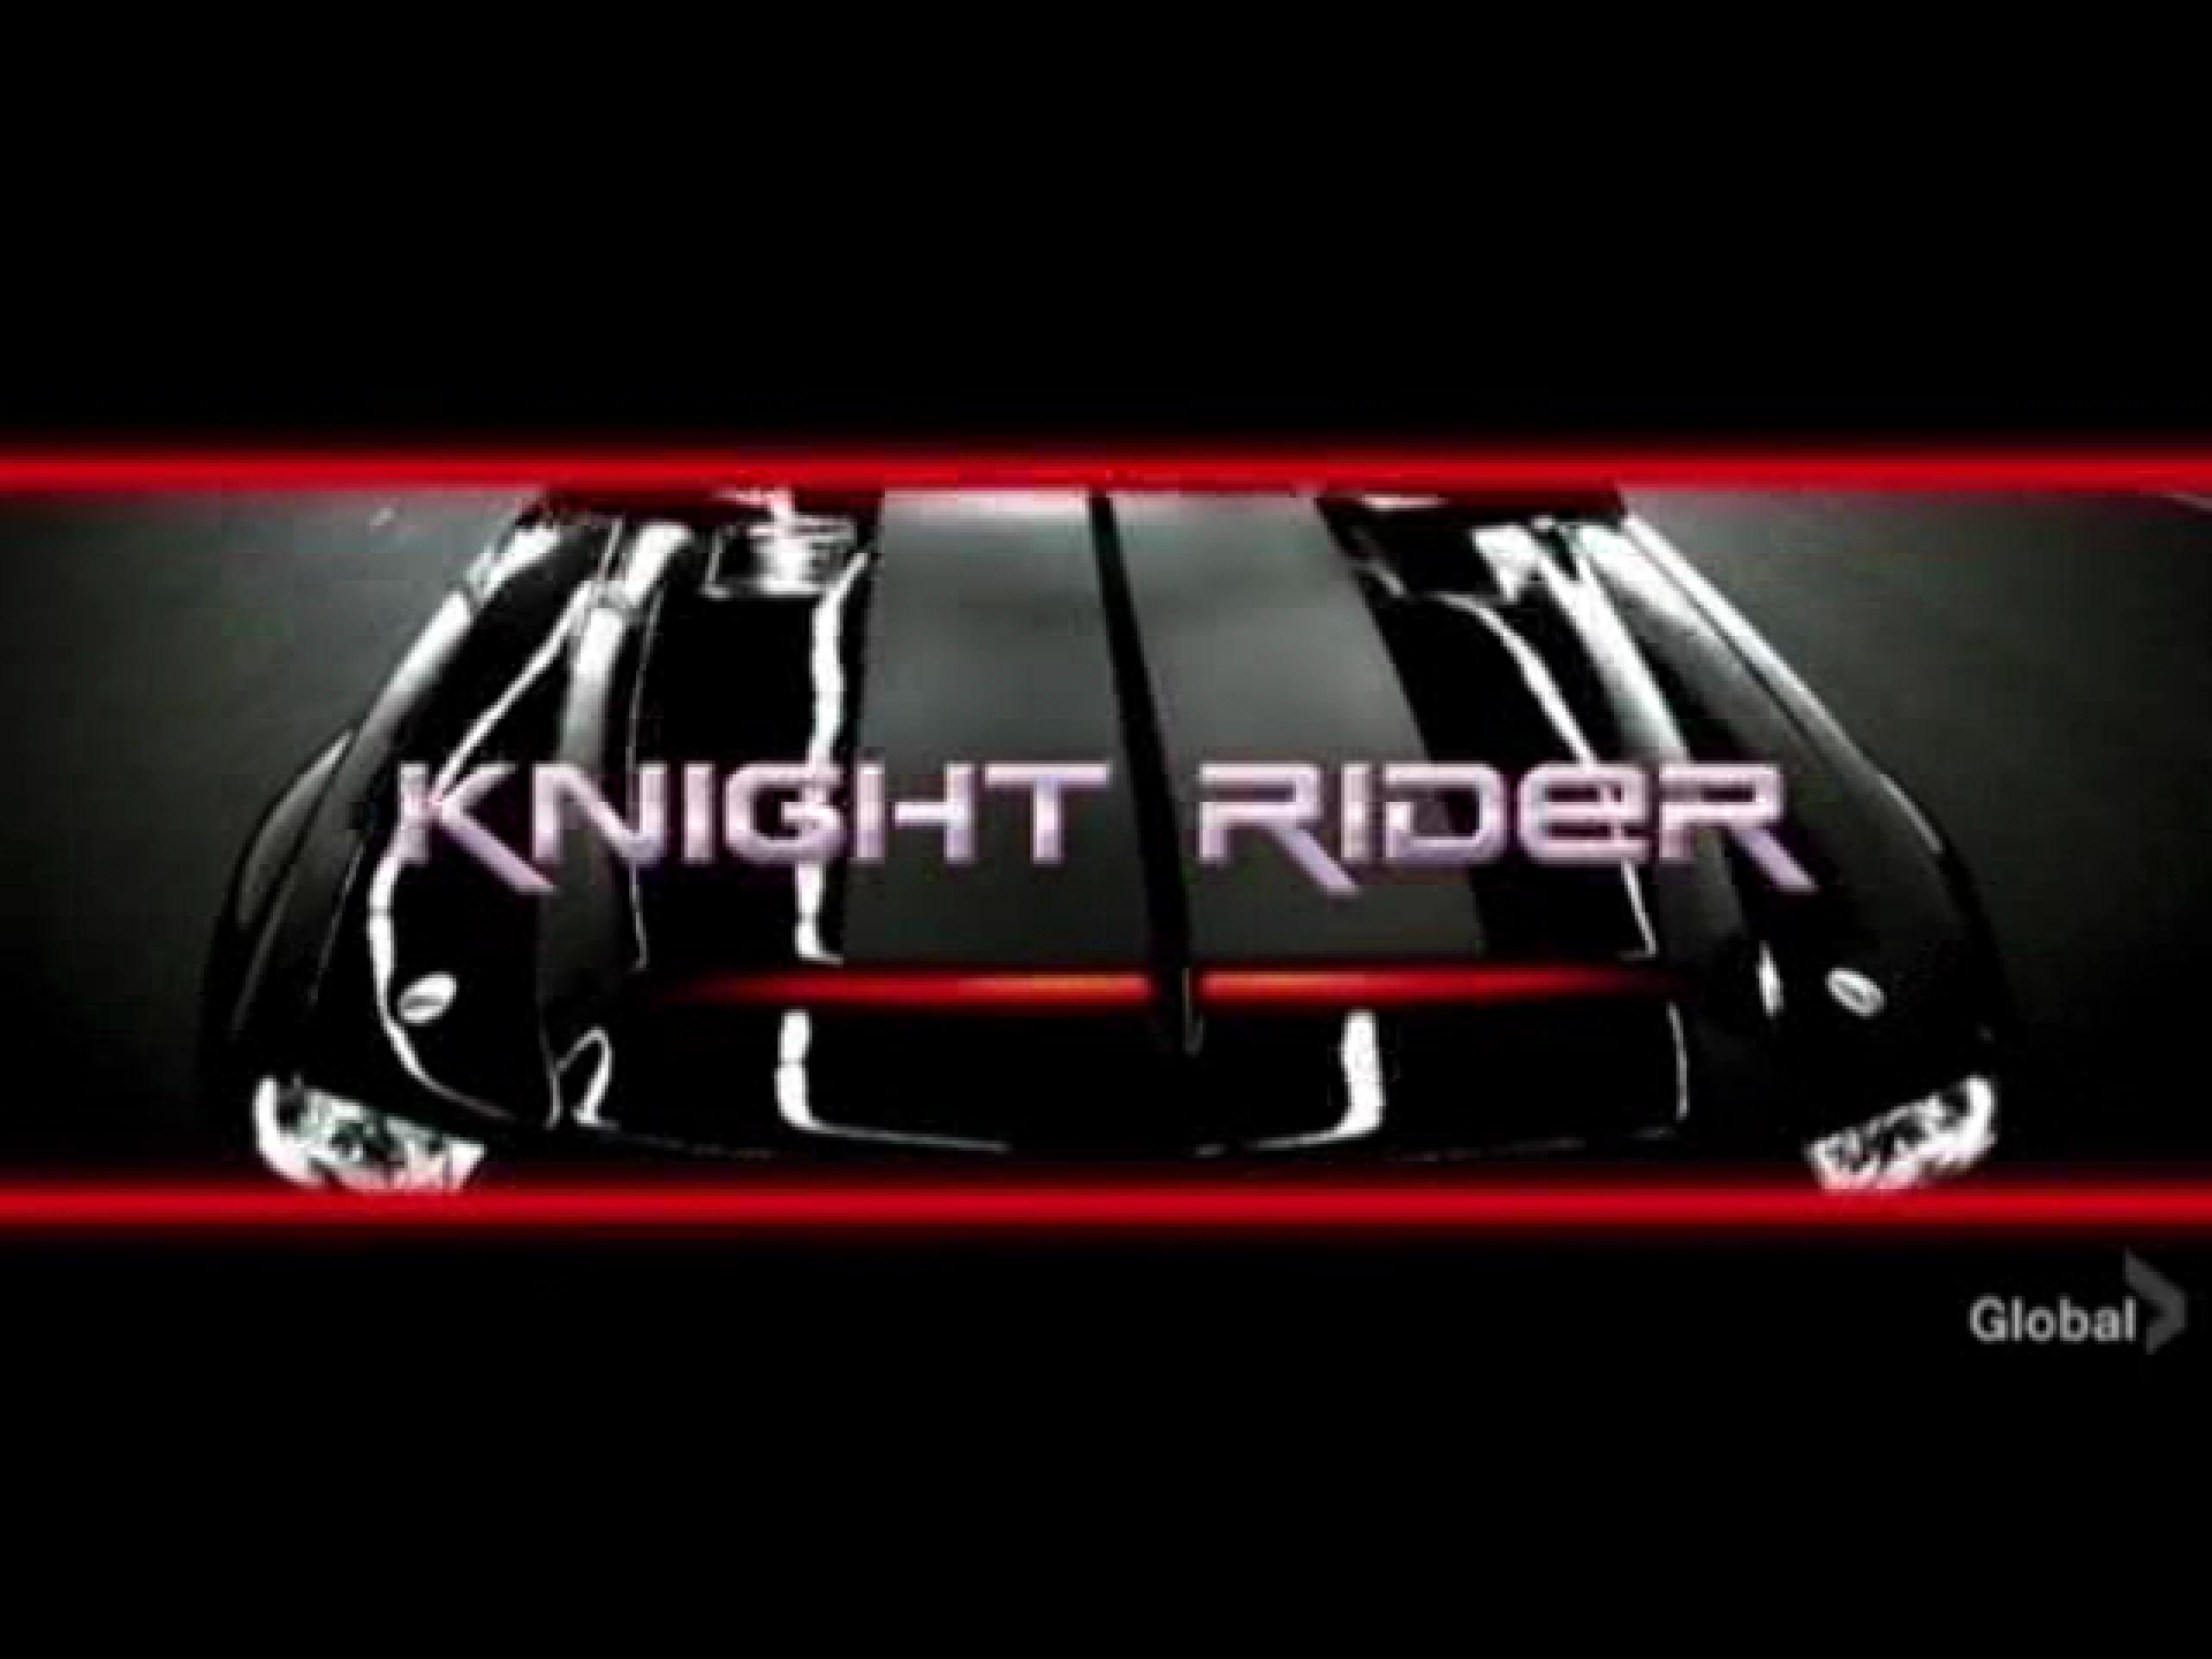 knight rider movie intro gta sa addon mod db. Black Bedroom Furniture Sets. Home Design Ideas